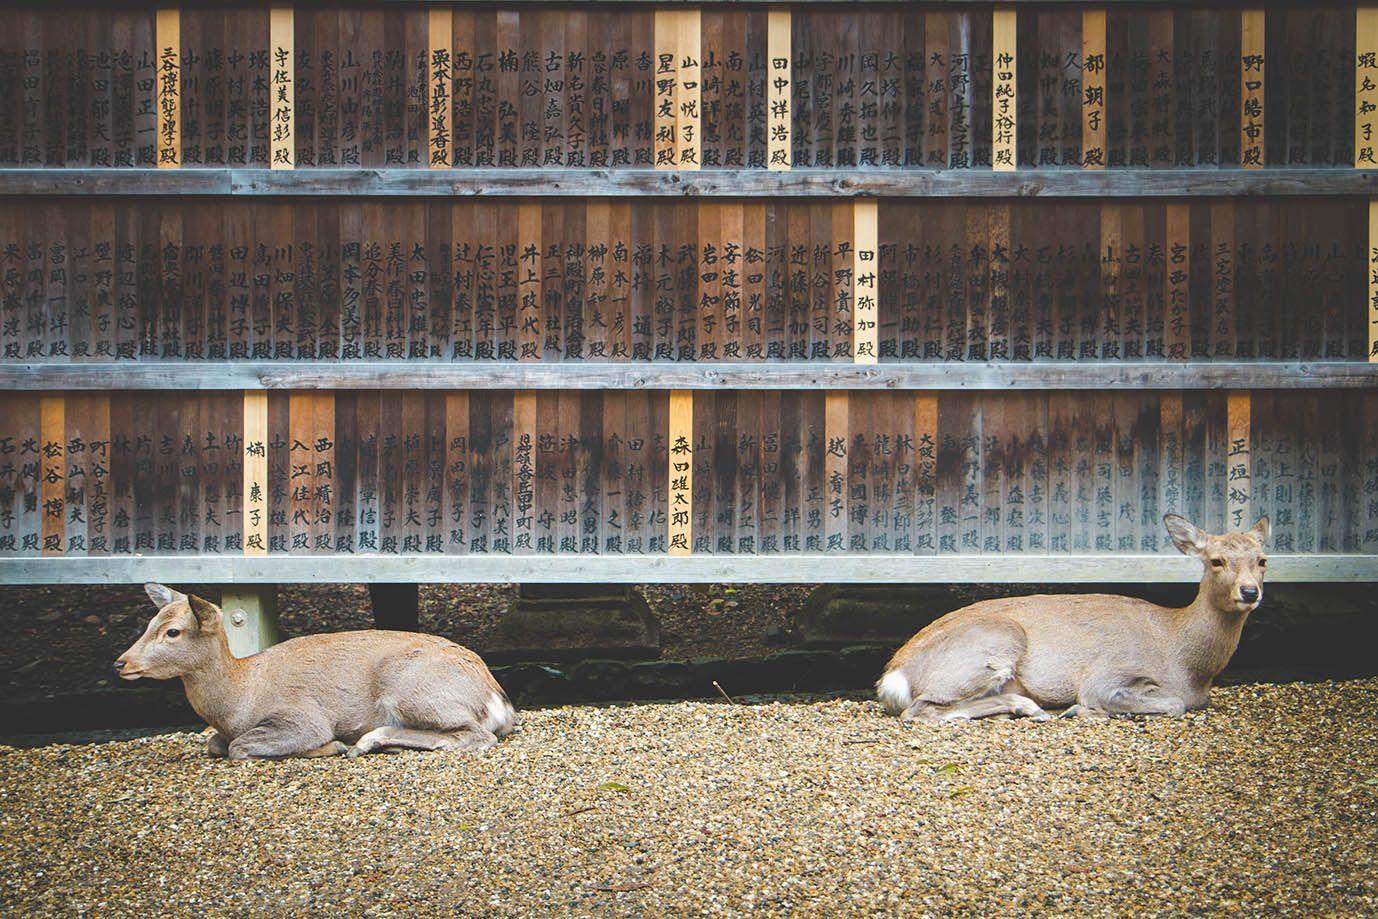 Kawaii deer at Nara Park